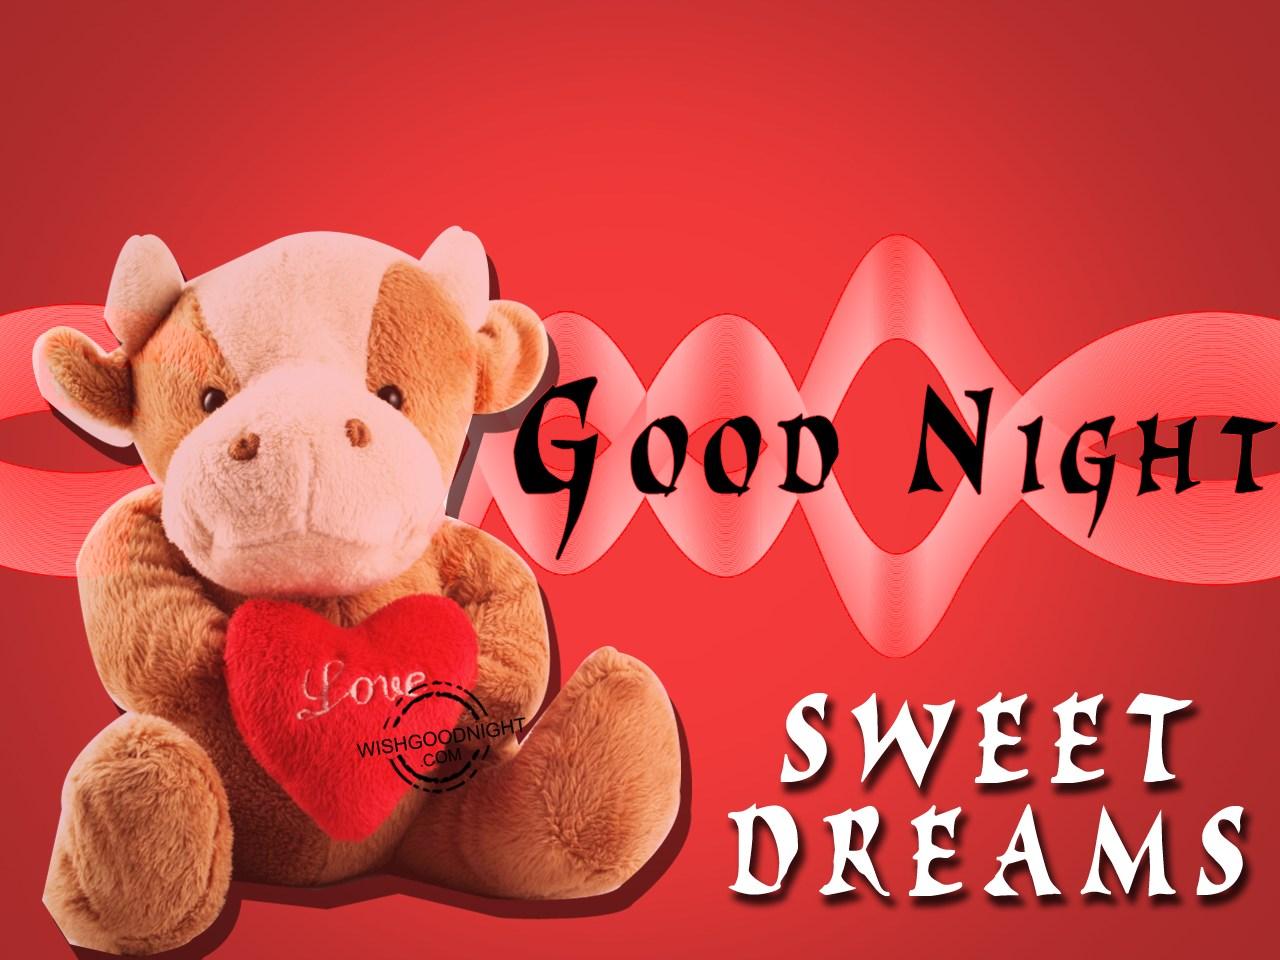 Good Night Wishes - Good Night Pictures – WishGoodNight.com